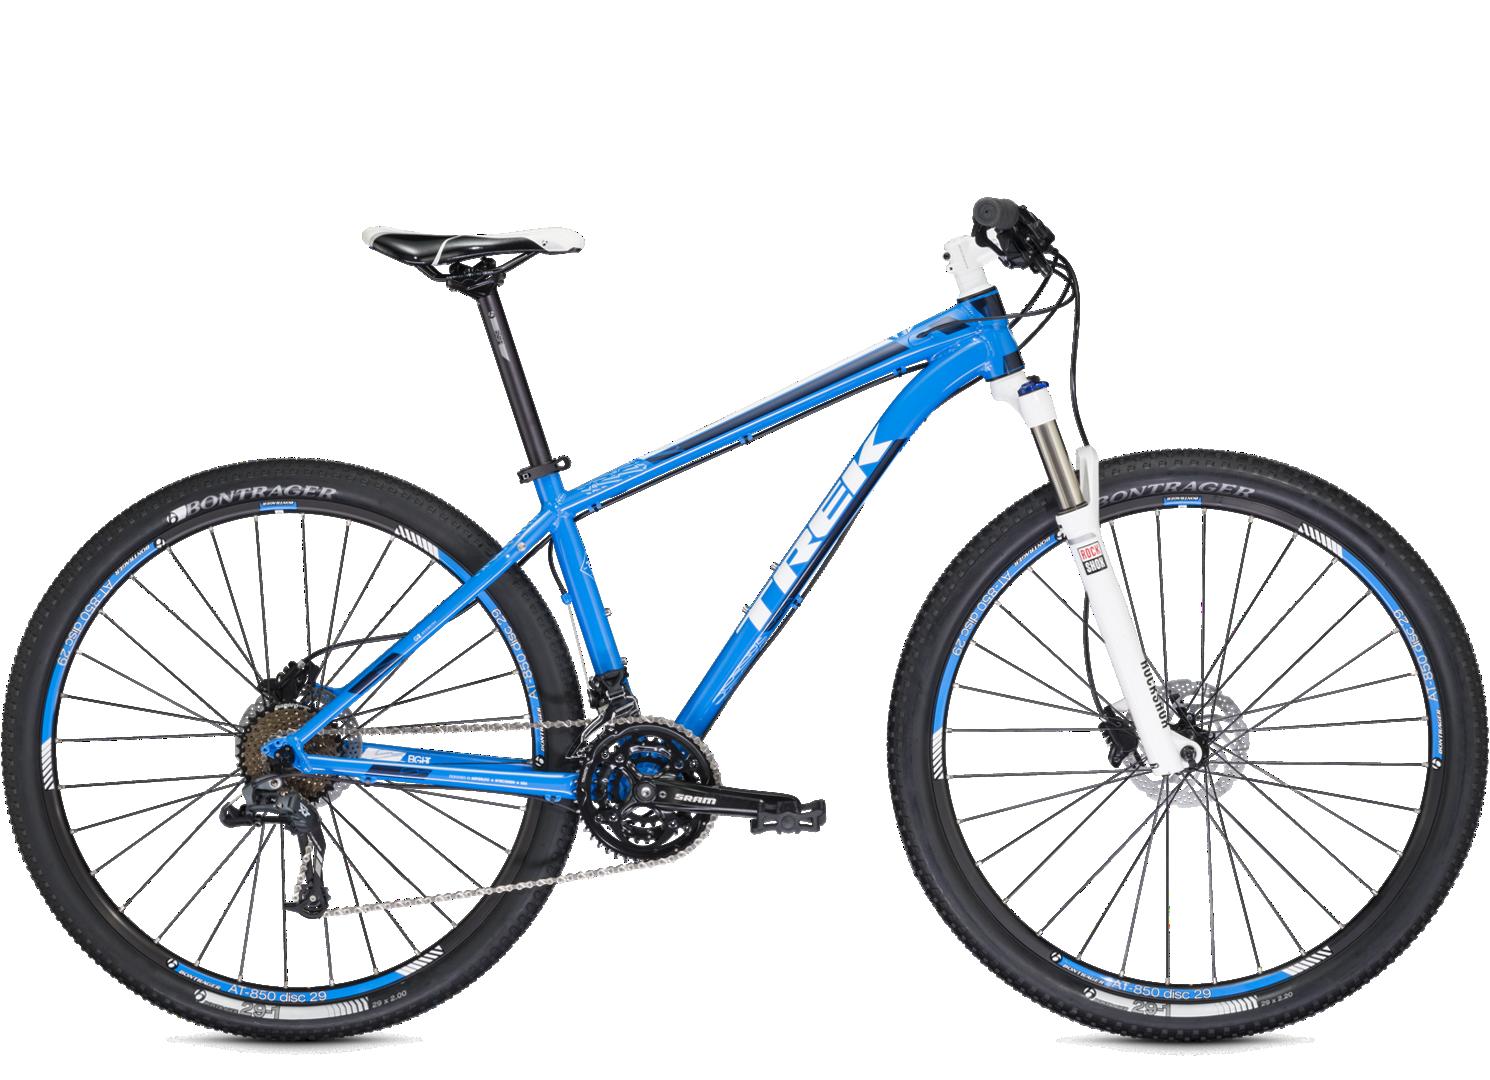 2014 X-Caliber 8 $849 99 - Bike Archive - Trek Bicycle Tires